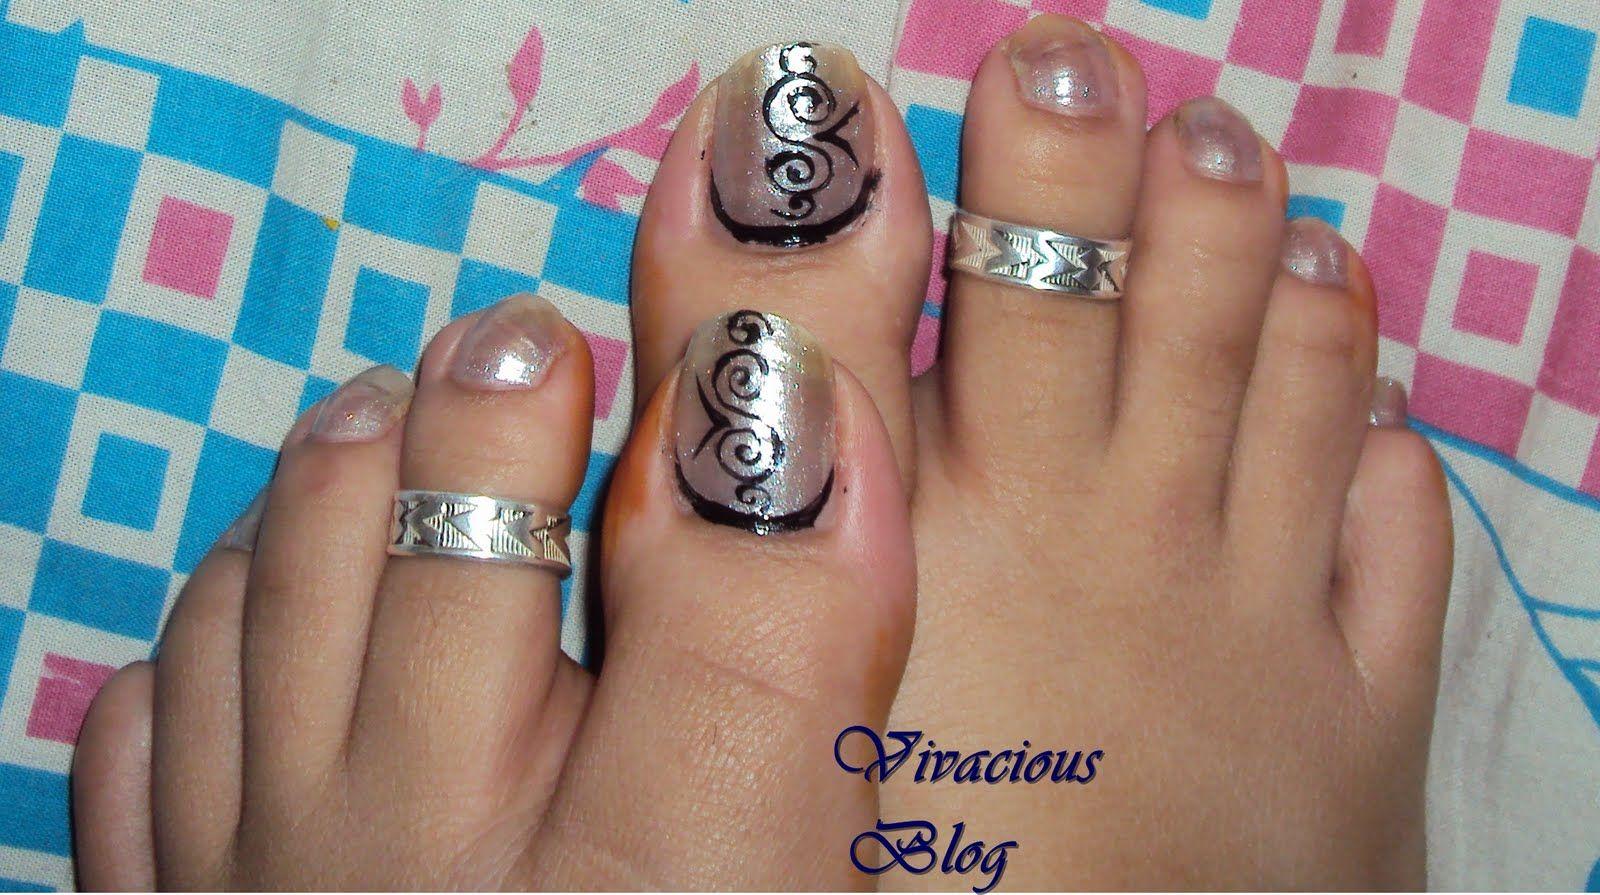 toenail designs | Vivacious Blog: Toe Nail Art | Nails | Pinterest ...